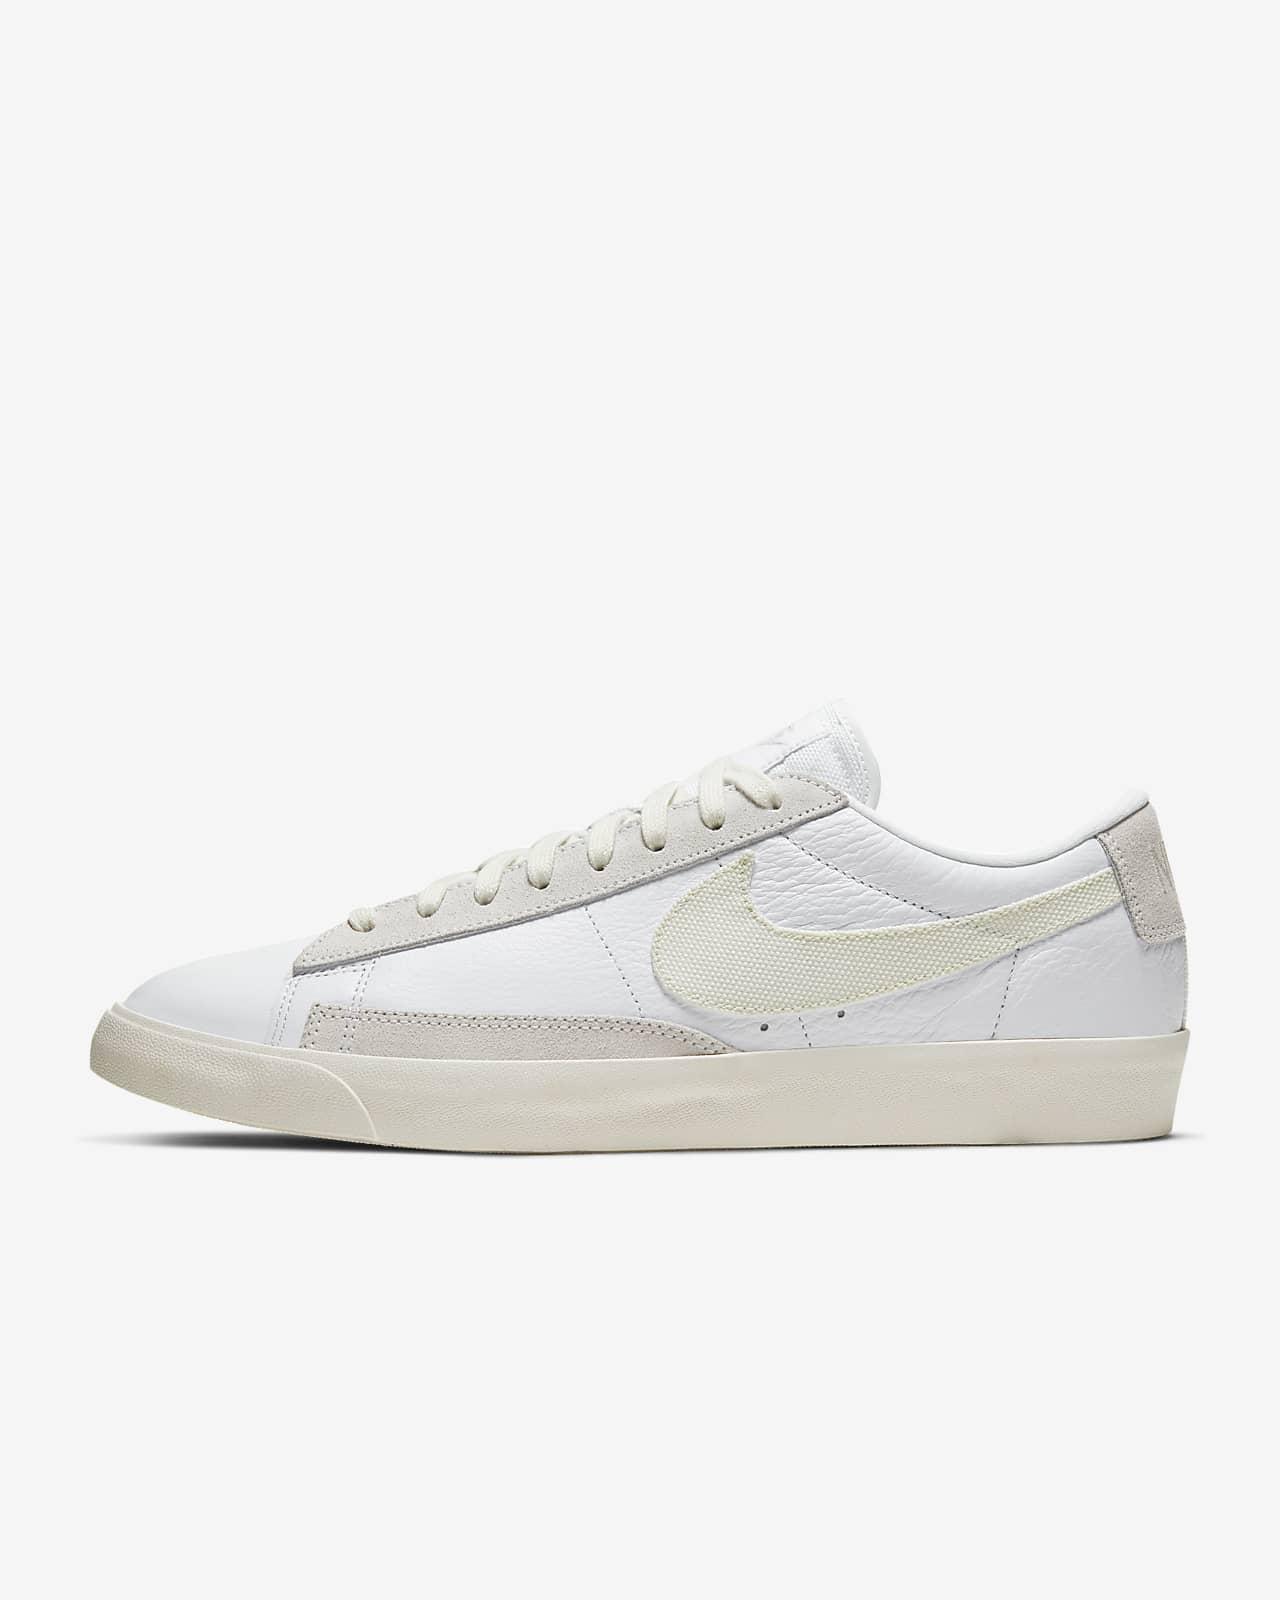 Nike Blazer Low Leather Shoe. Nike HU